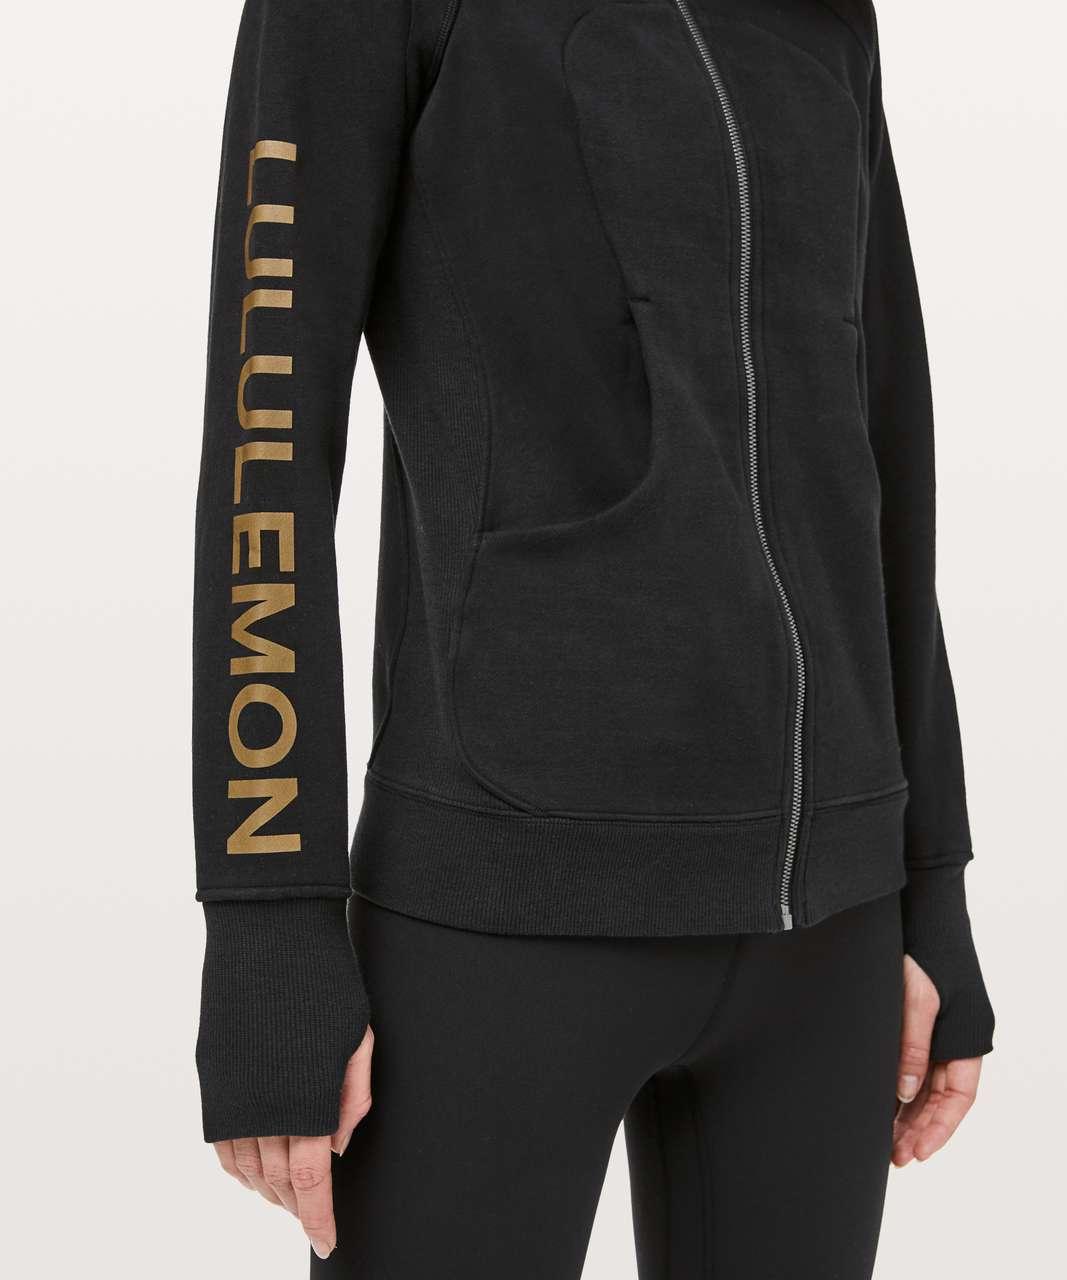 Lululemon Scuba Hoodie Classic Cotton Fleece *Lunar New Year - Black